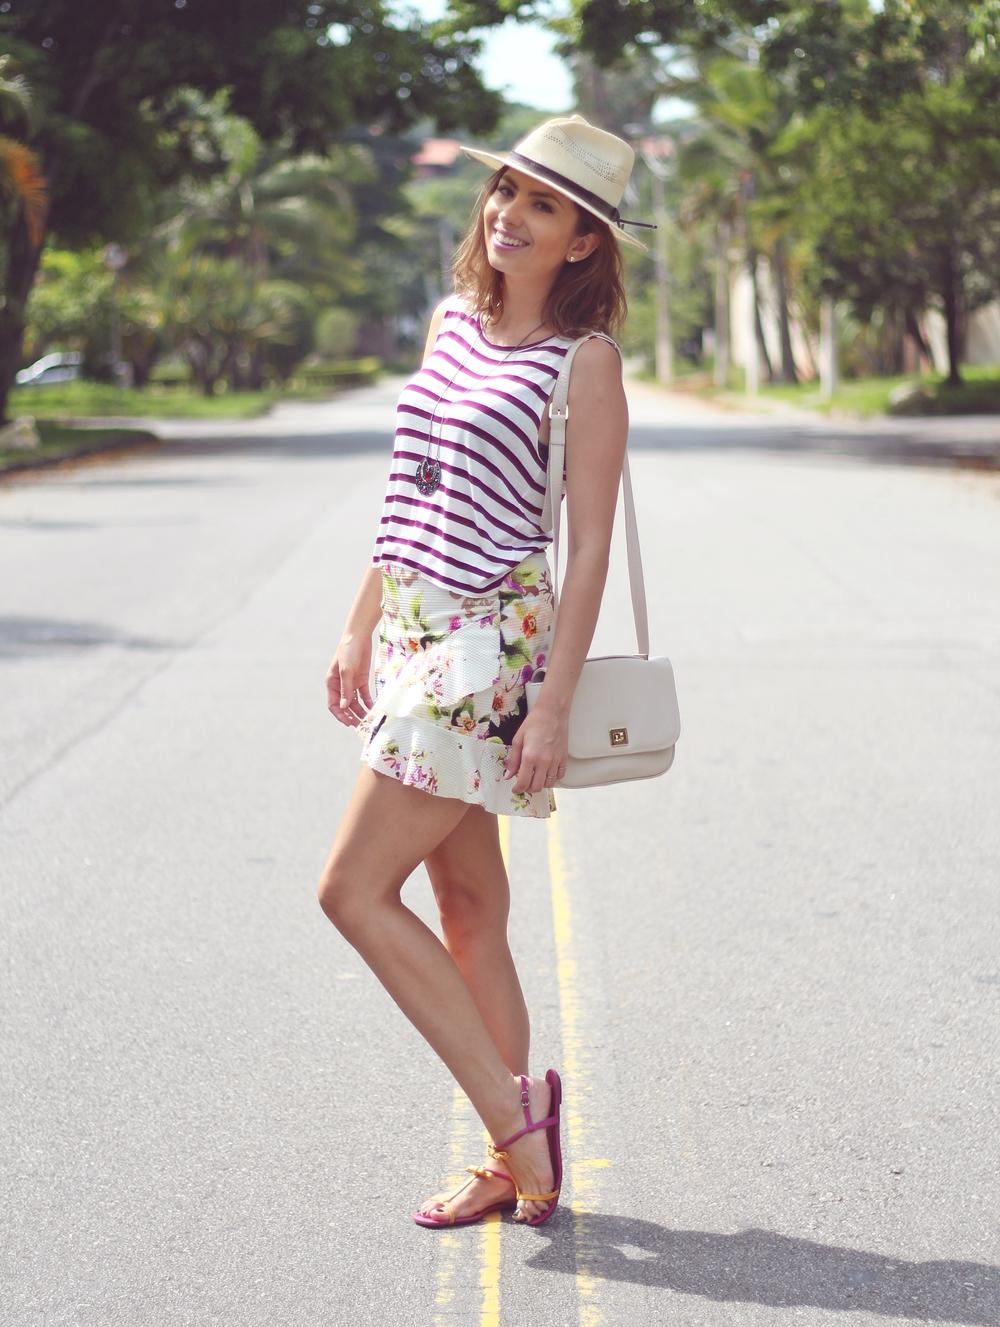 vanduarte-mix-estampas-listras-floral-look3-4